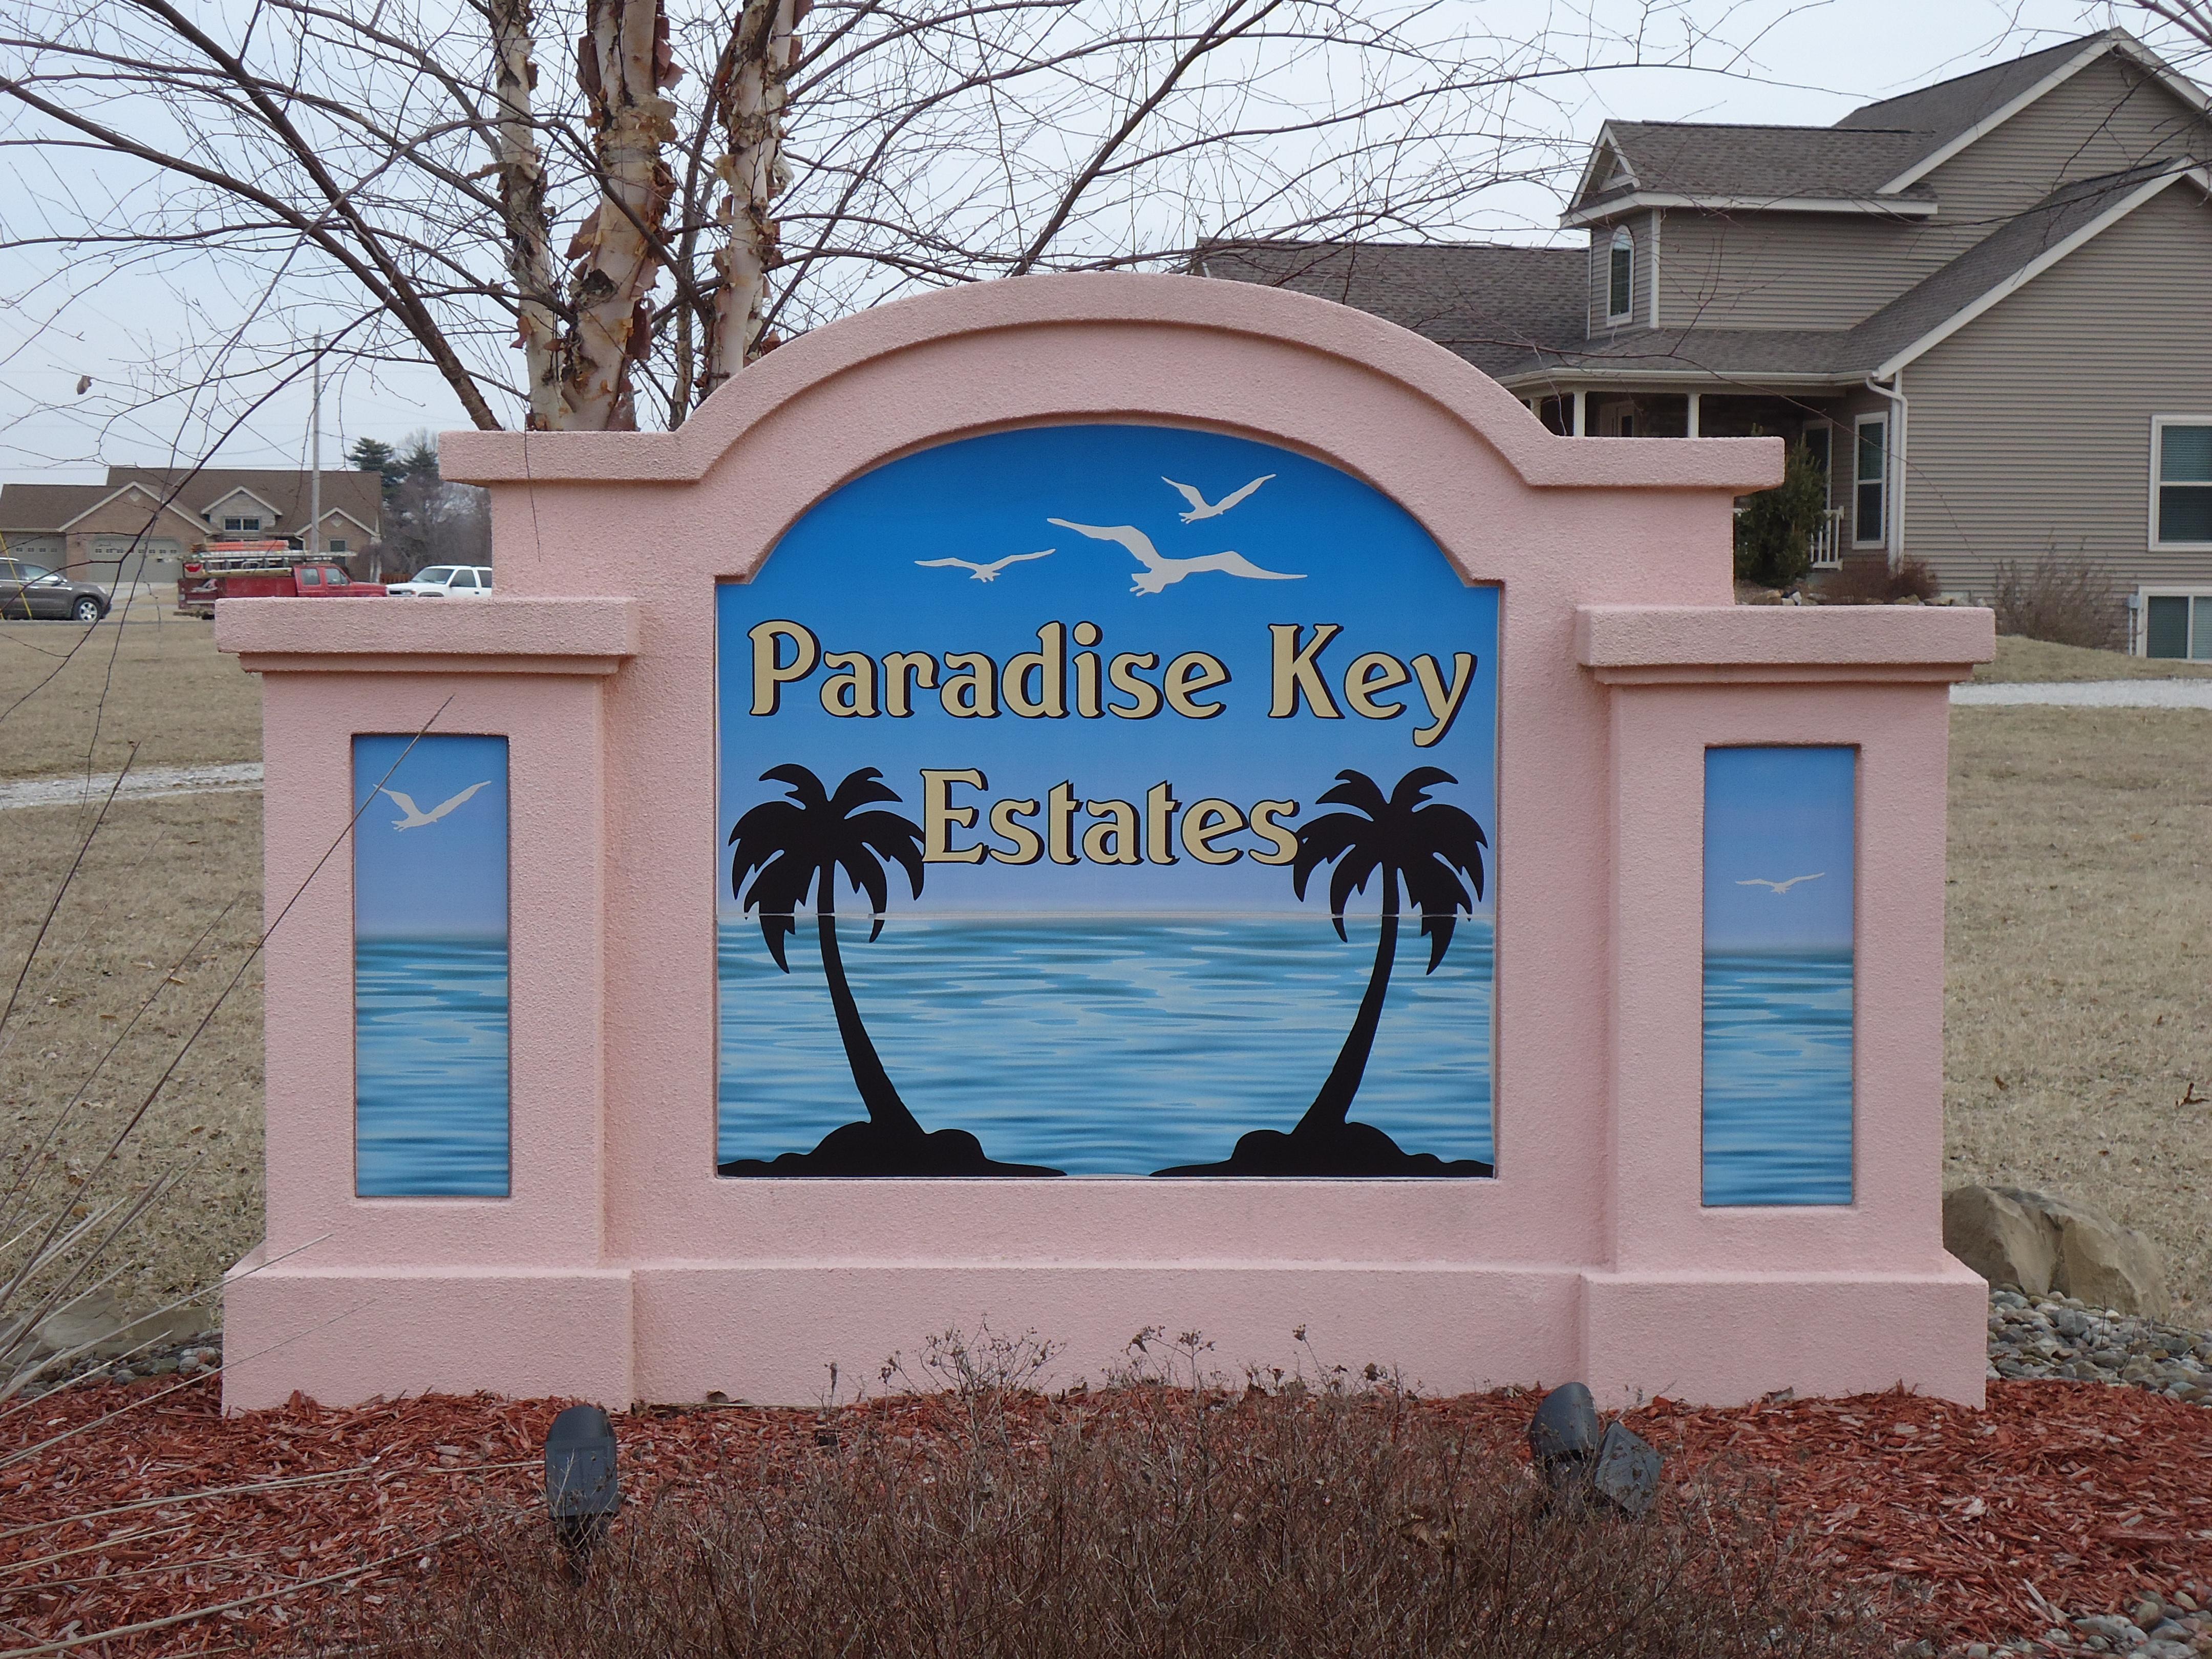 Paradise Key Estates